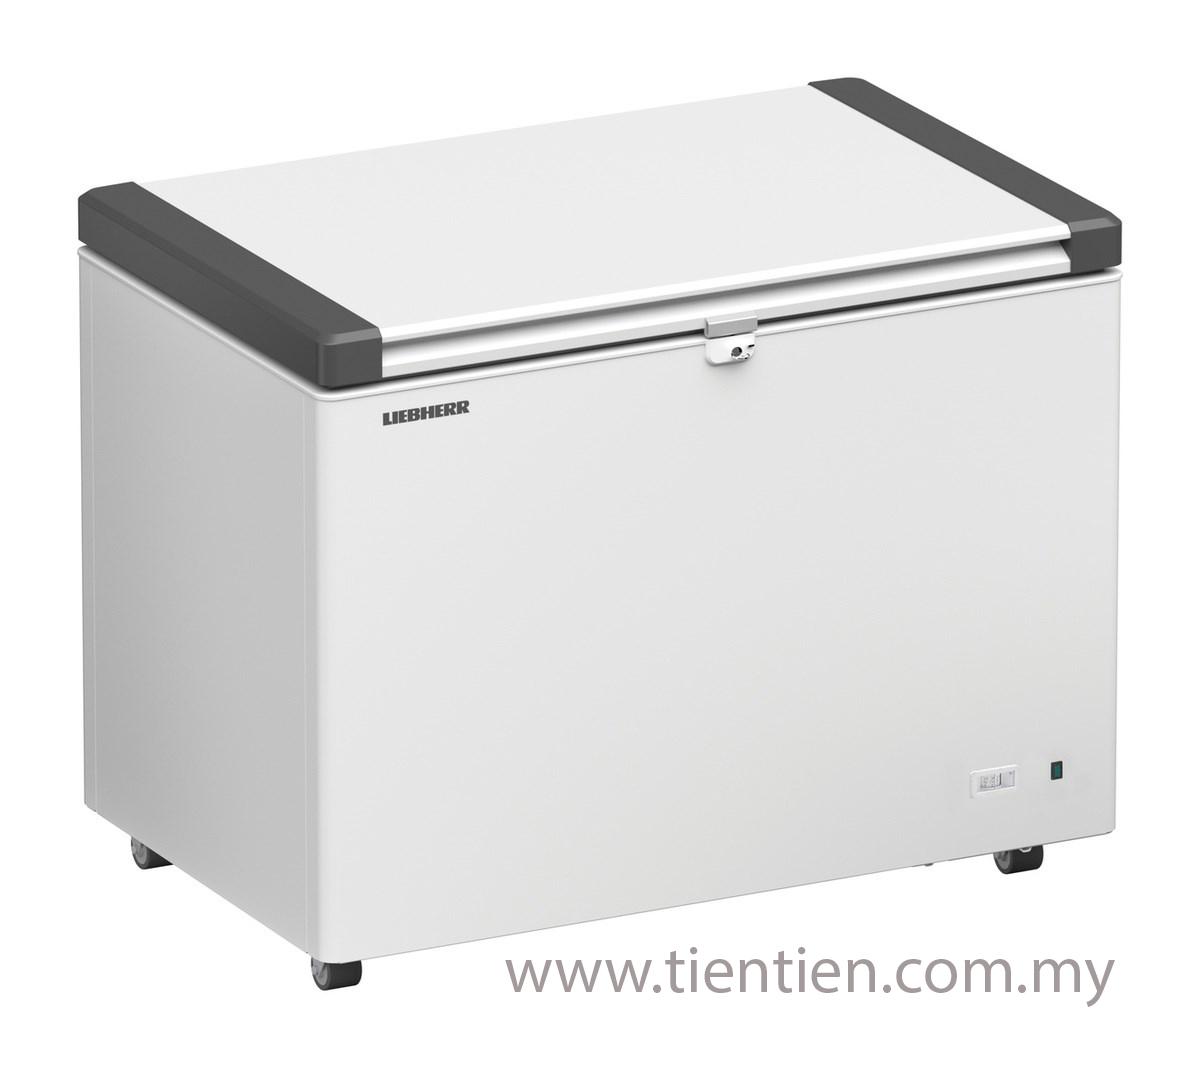 EFL 3005-top-opening-chest-freezer-malaysia.jpg